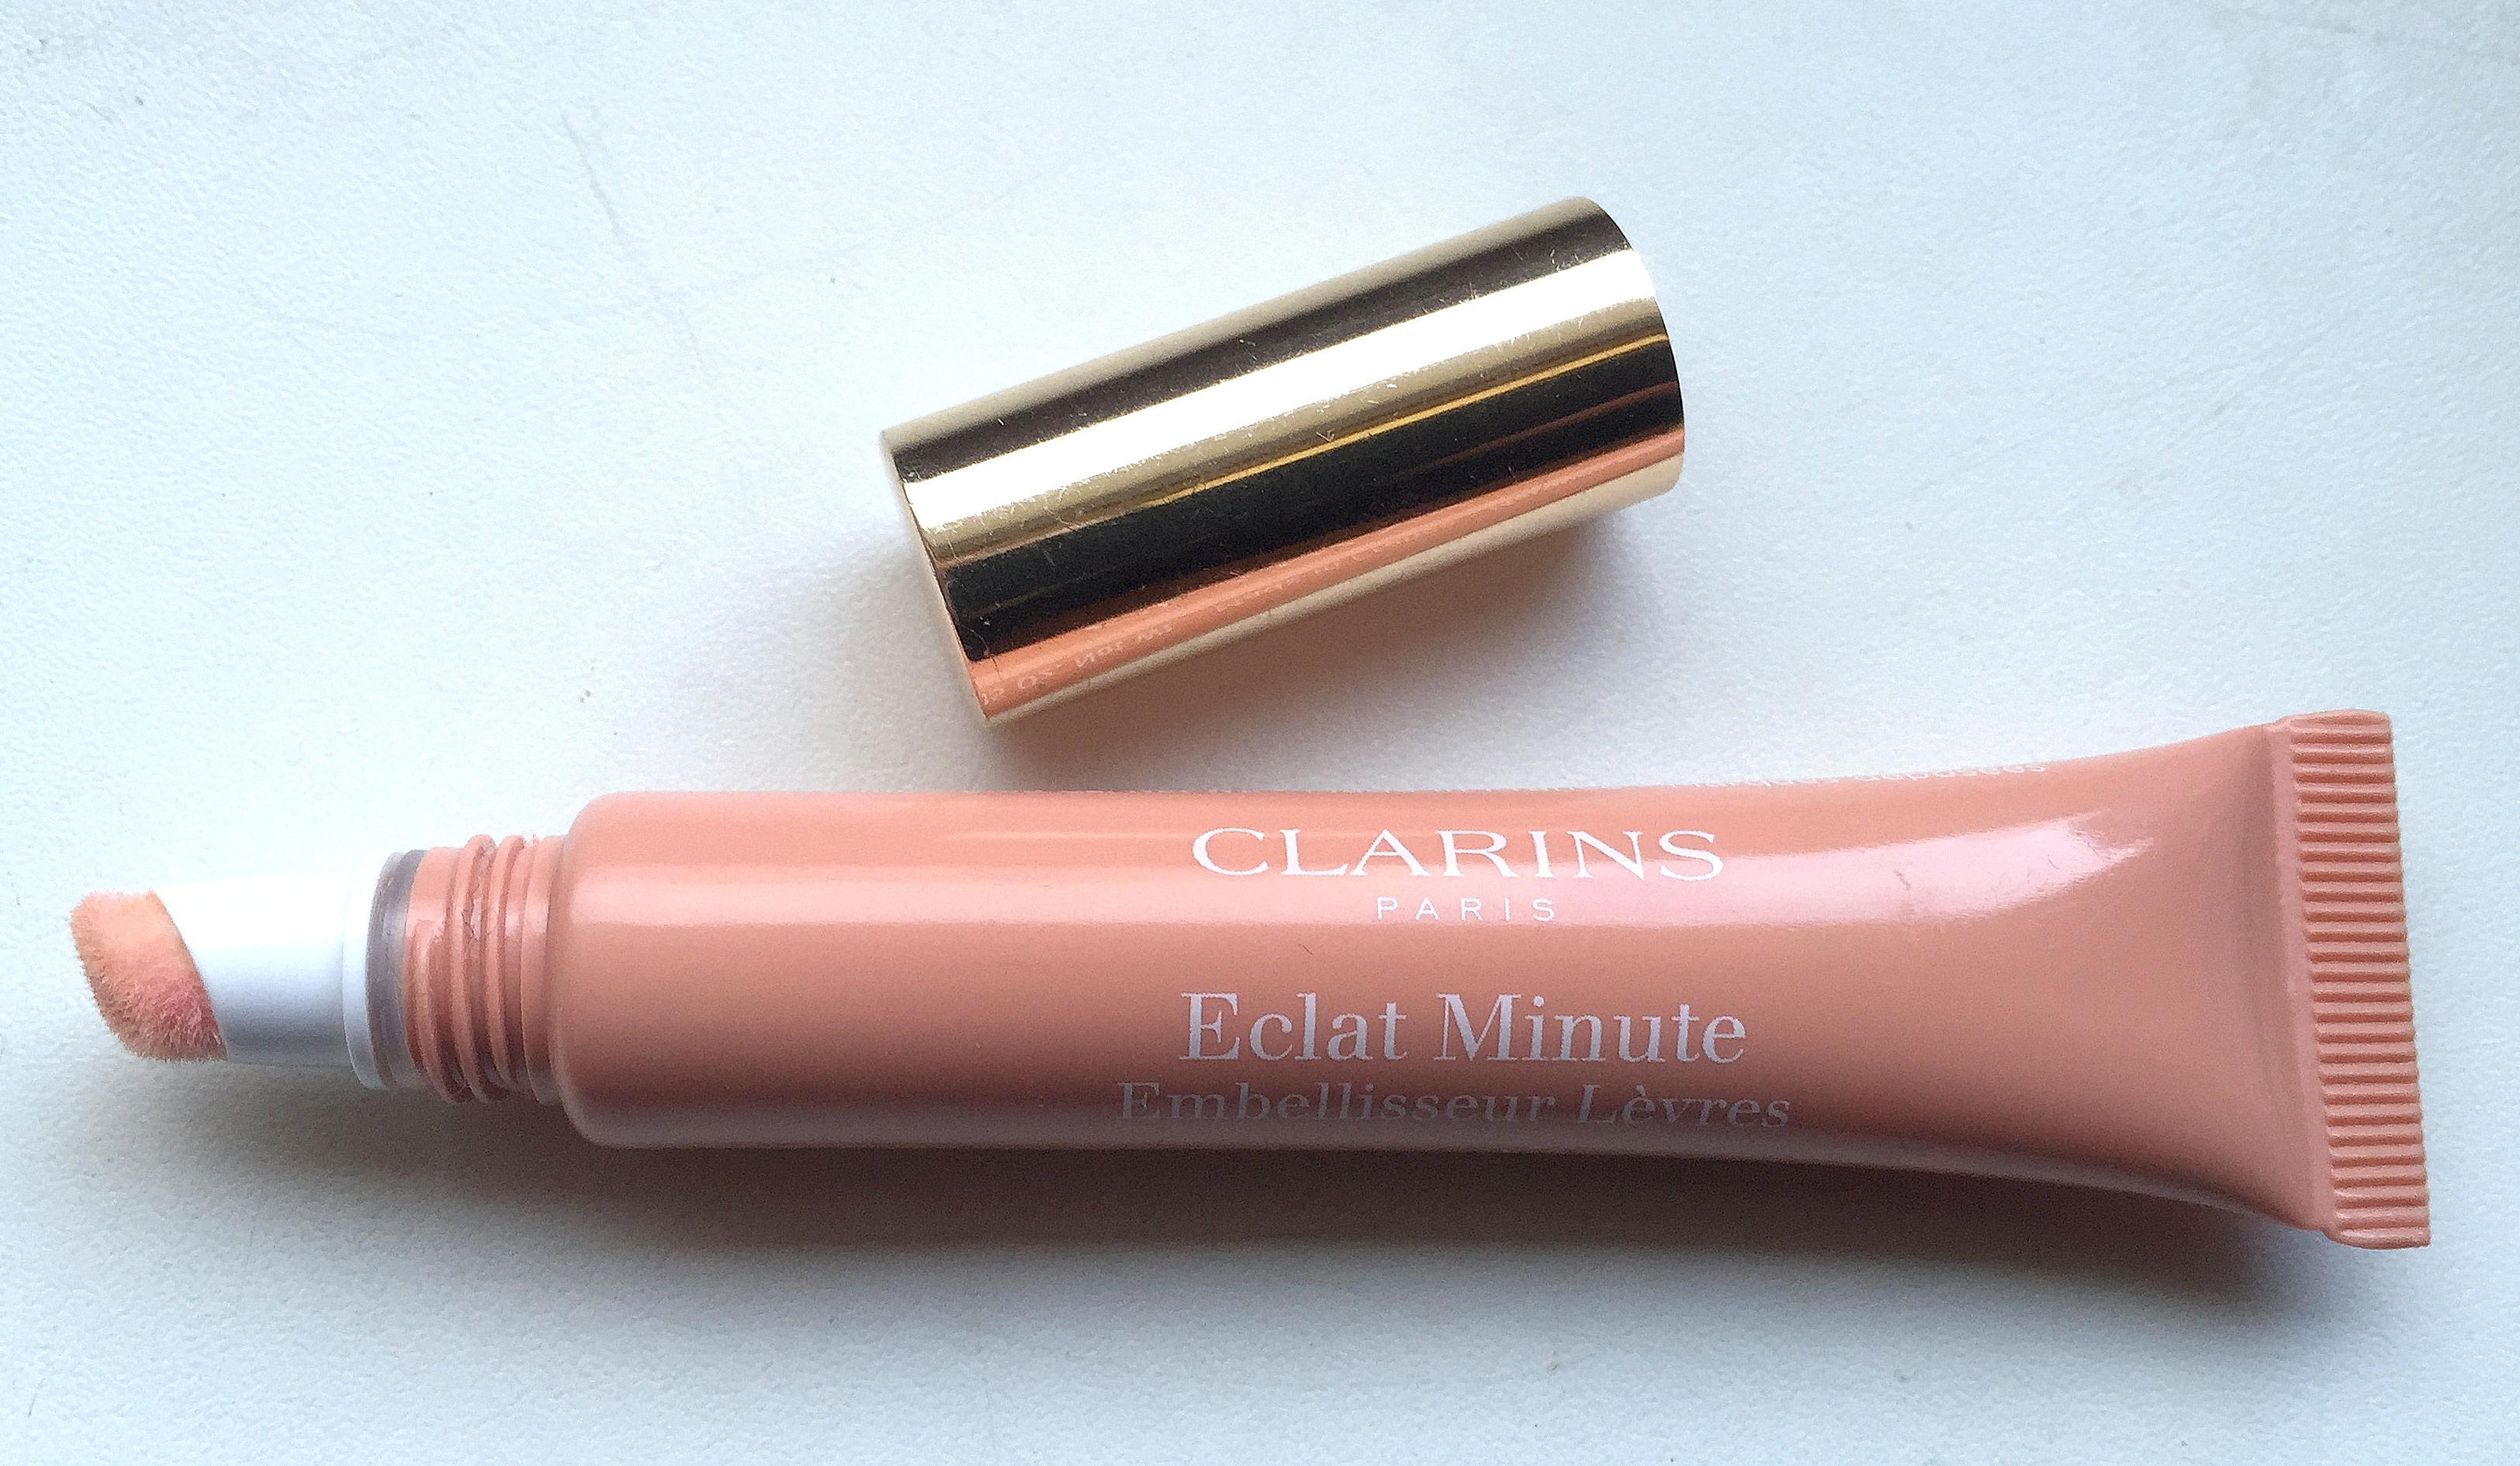 CLARINS Eclat Minute Embelliseur Lèvres - Highendlove